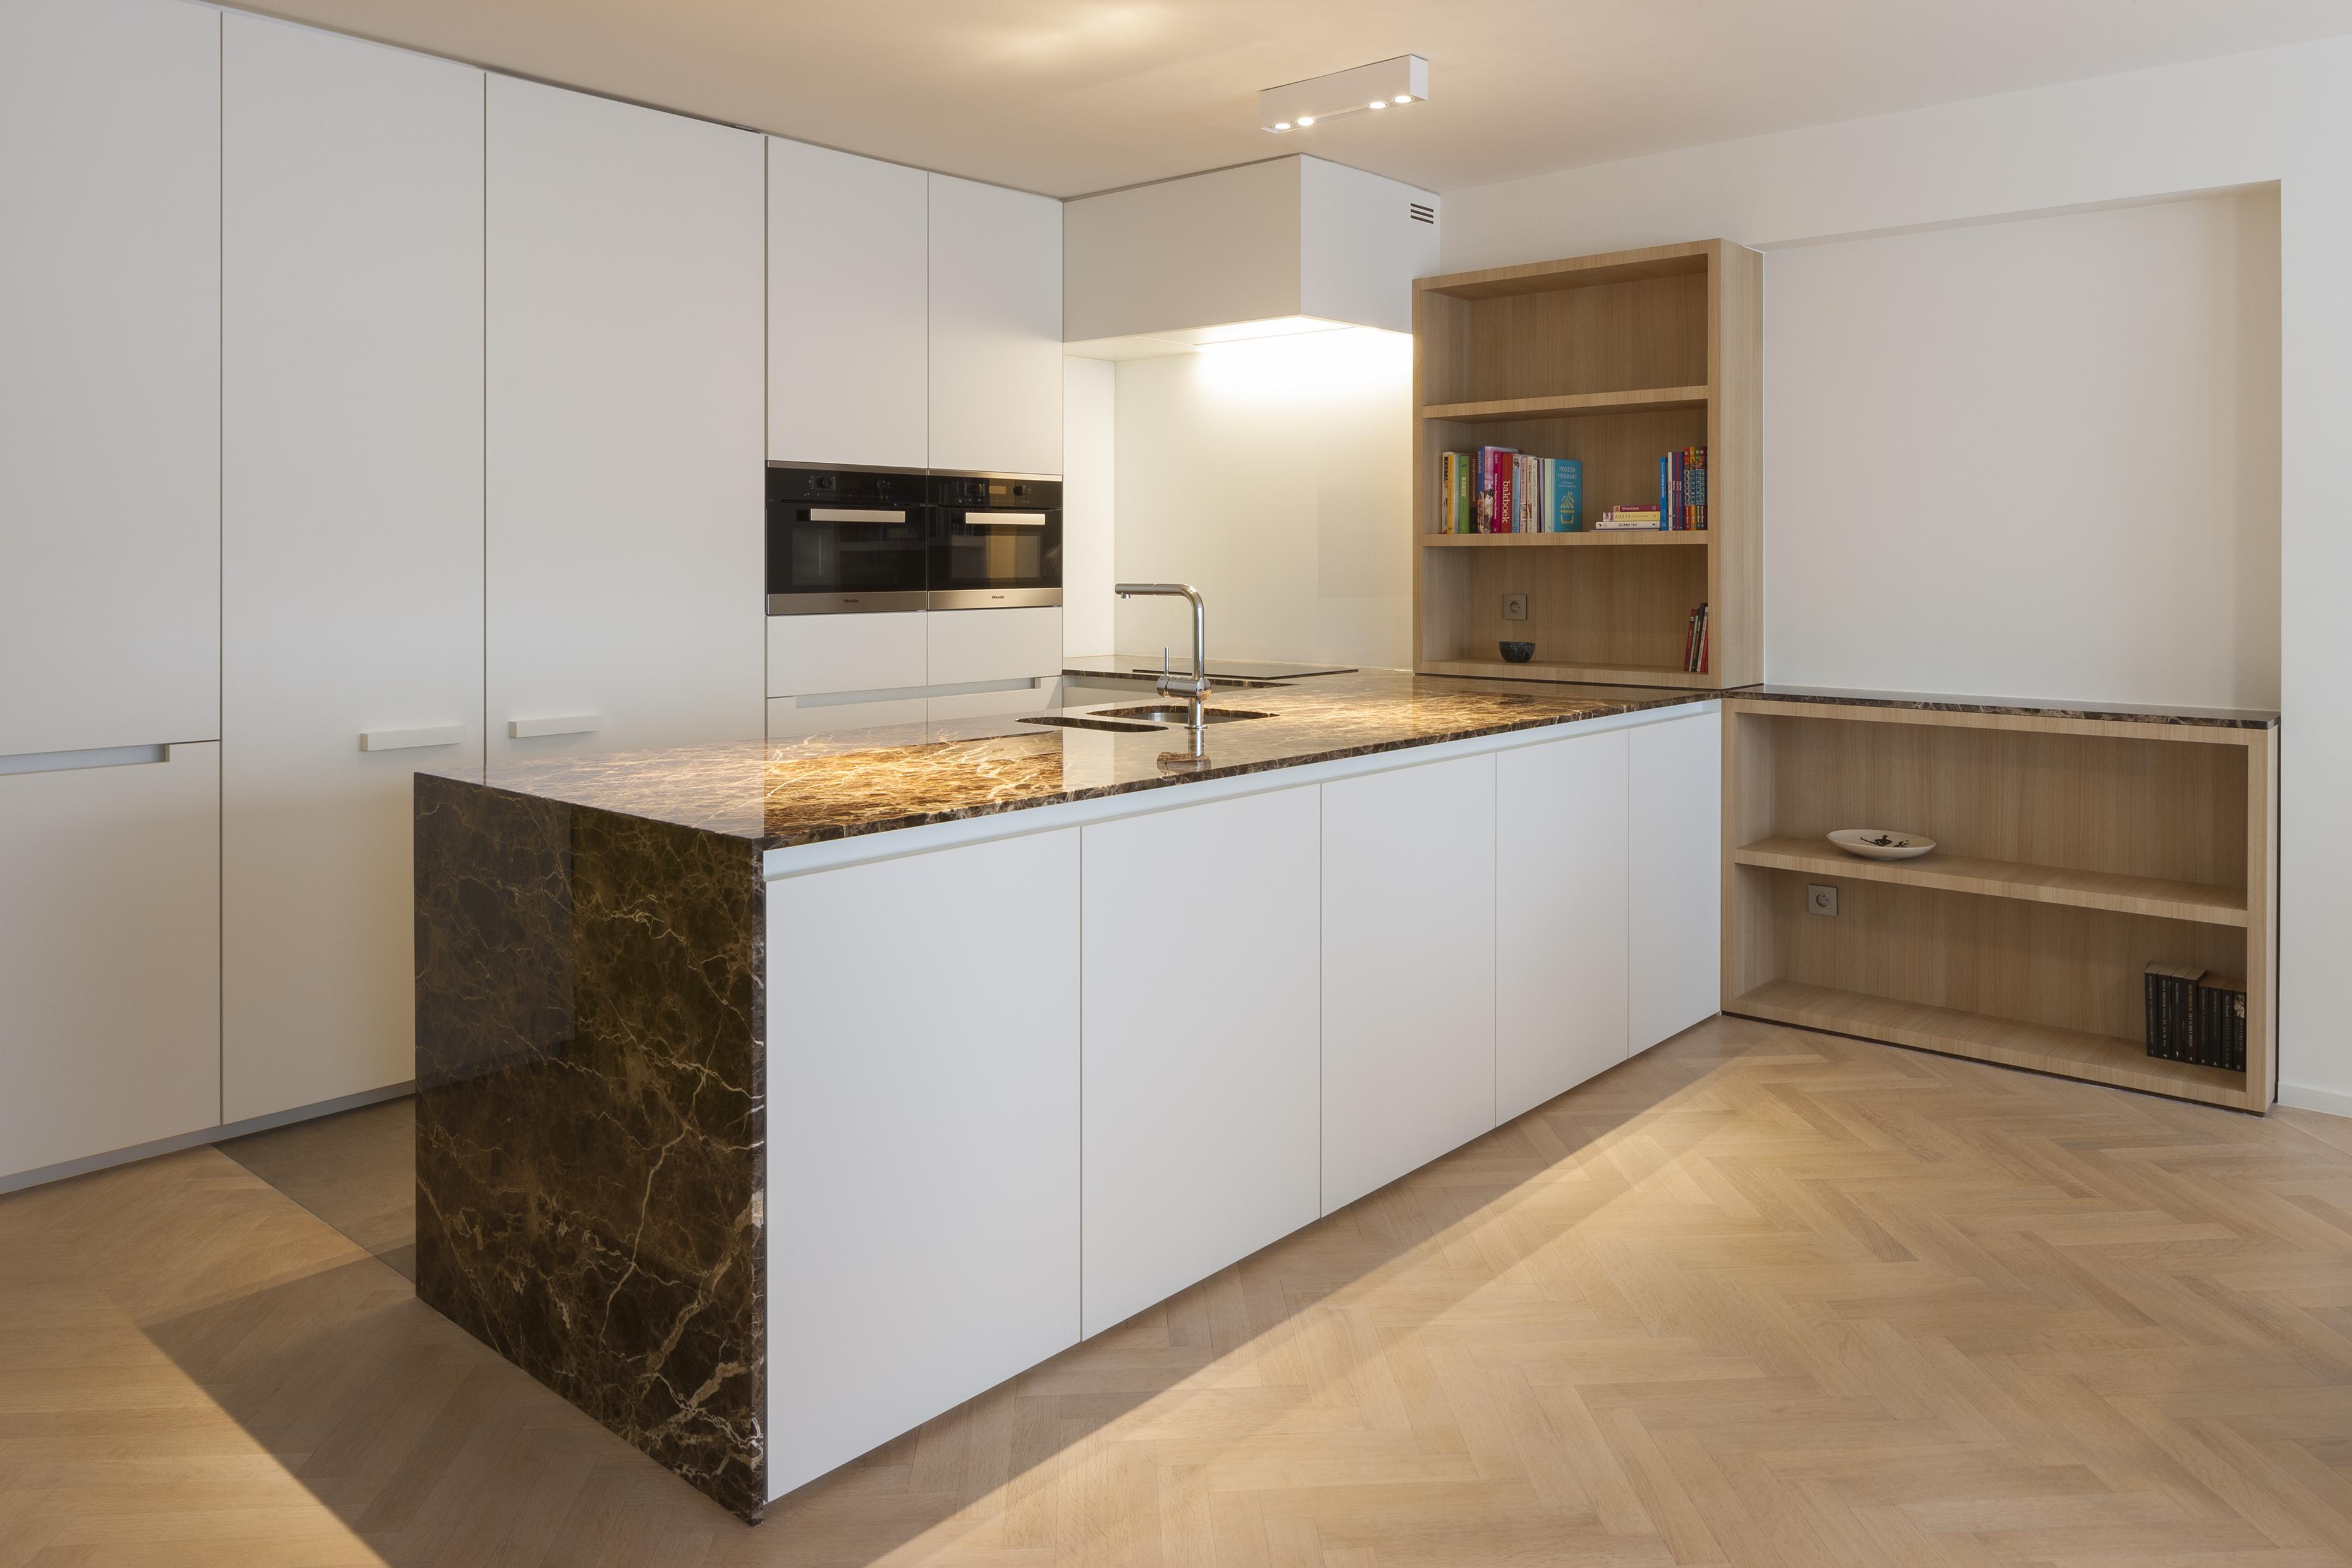 Badkamer Design Mortsel : Appartement te mortsel c ak sent interieurarchitectuur